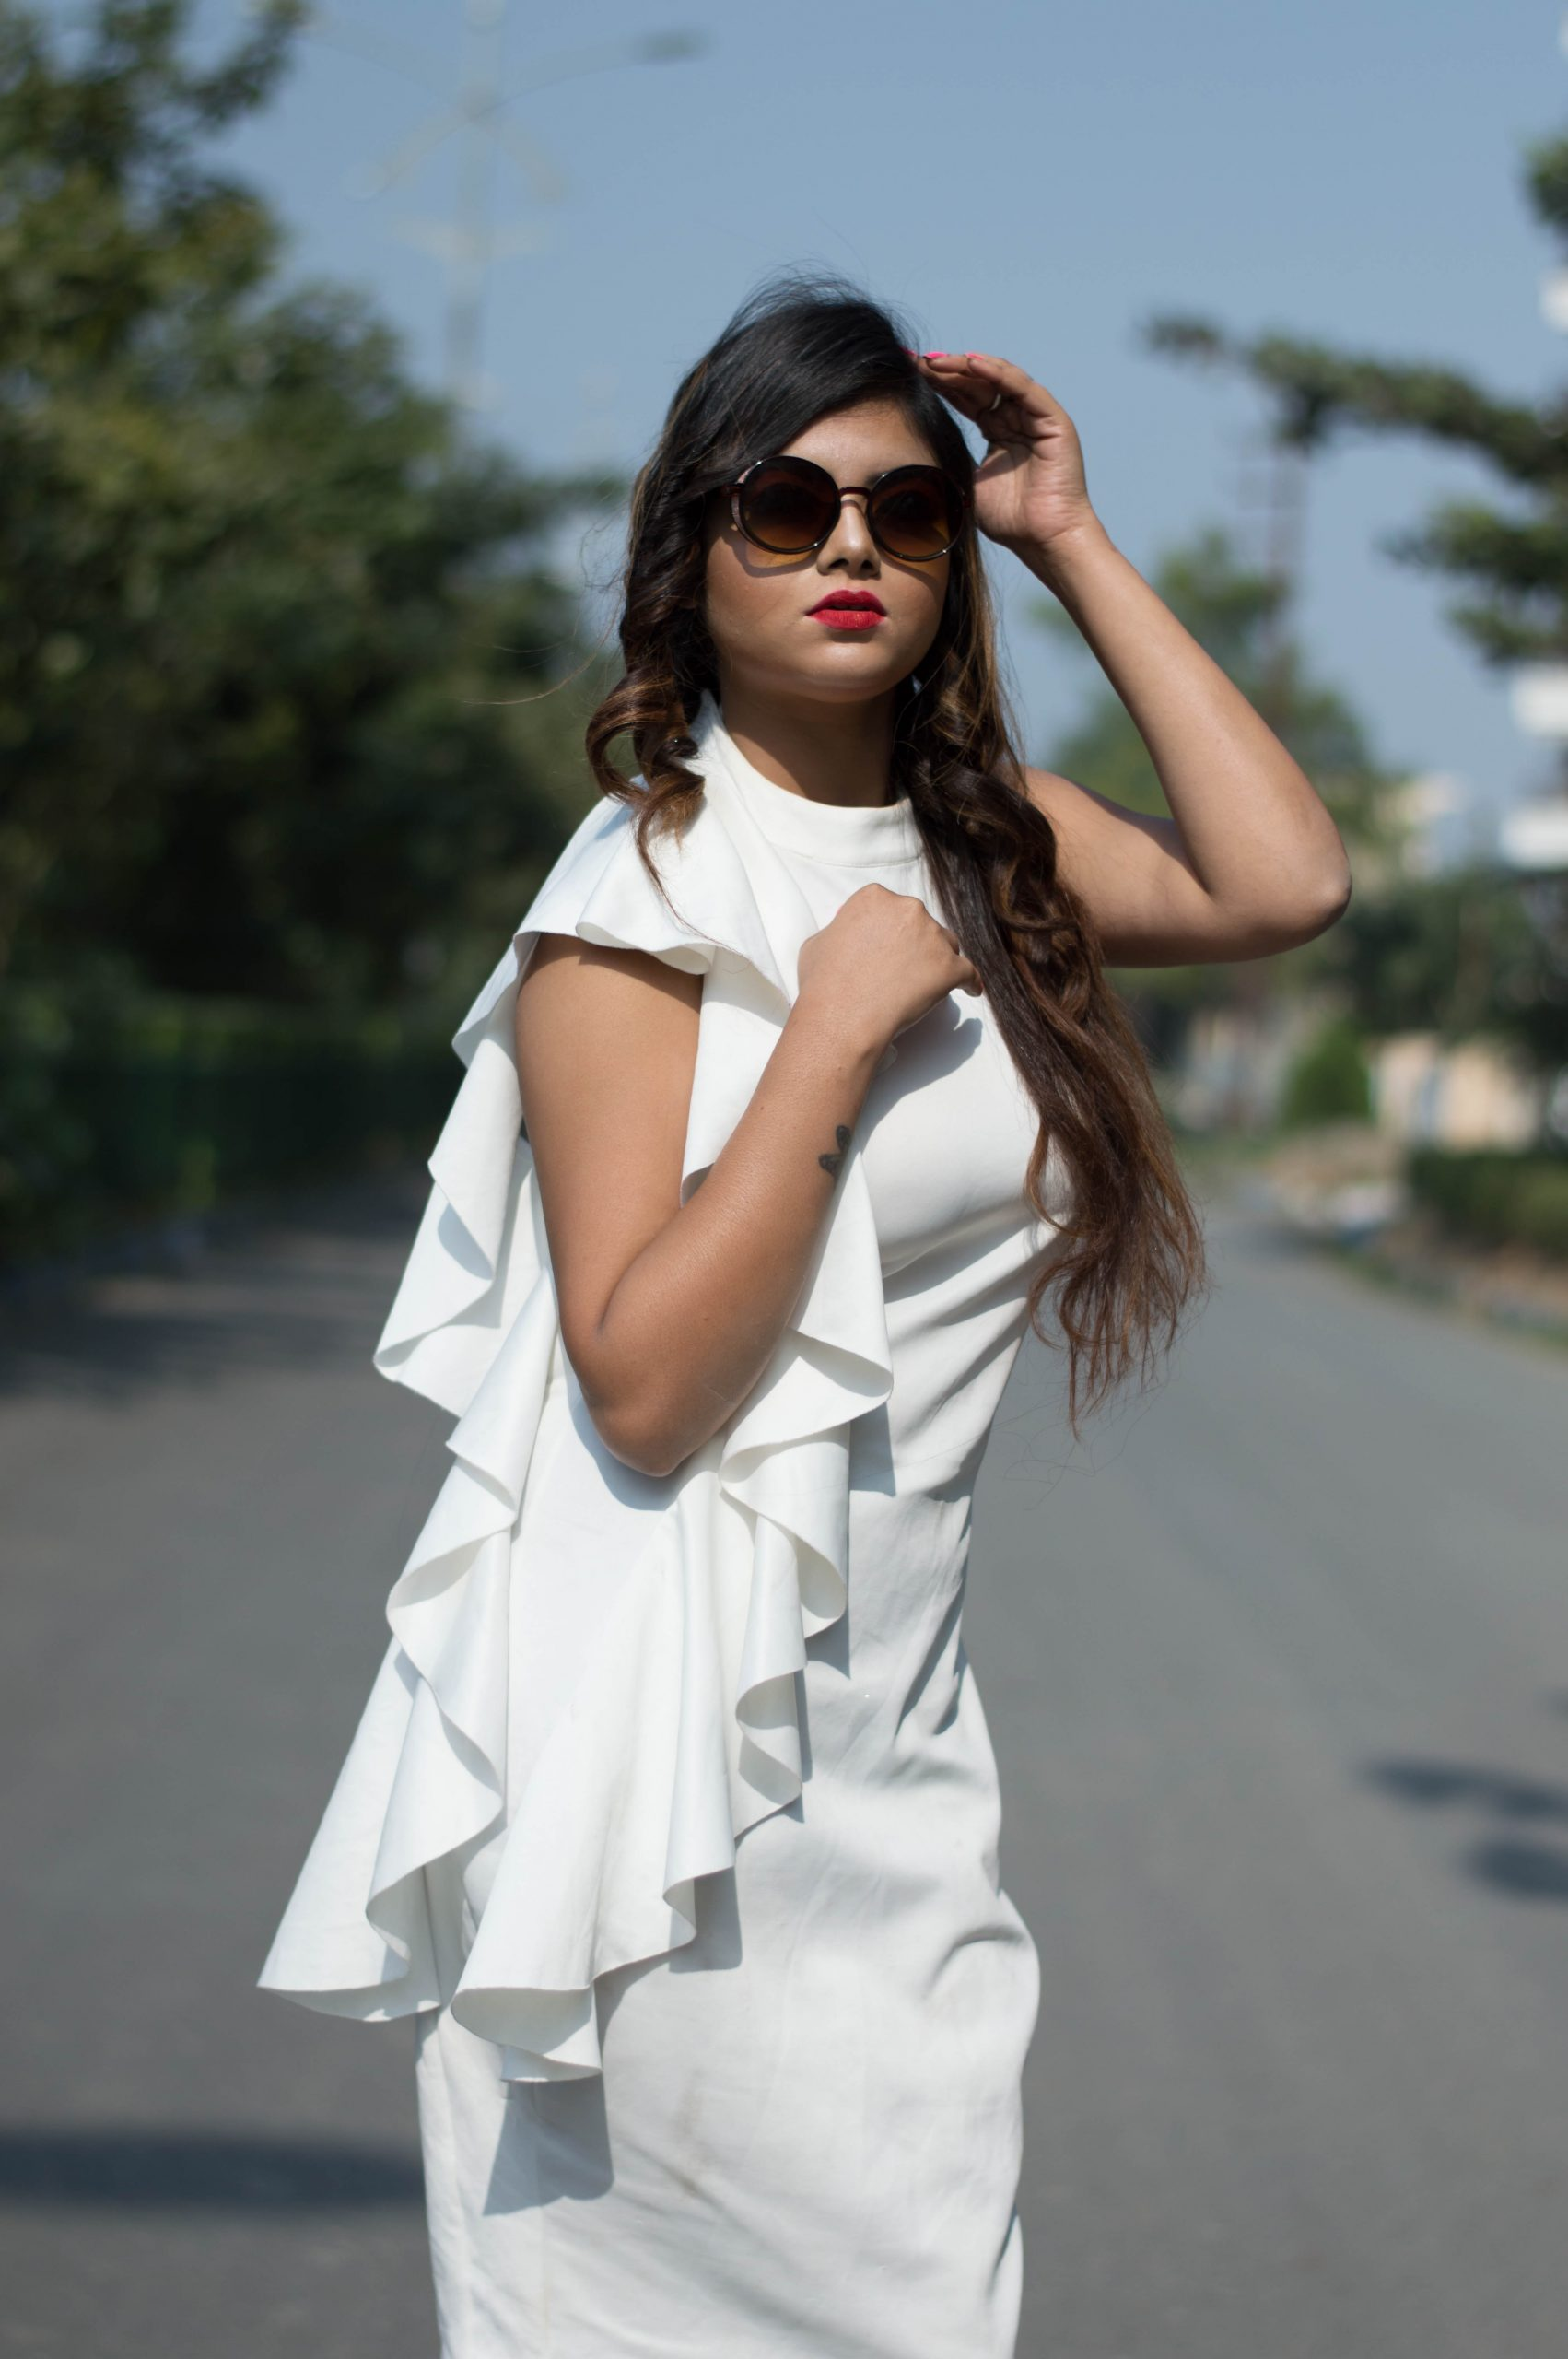 Model posing on road